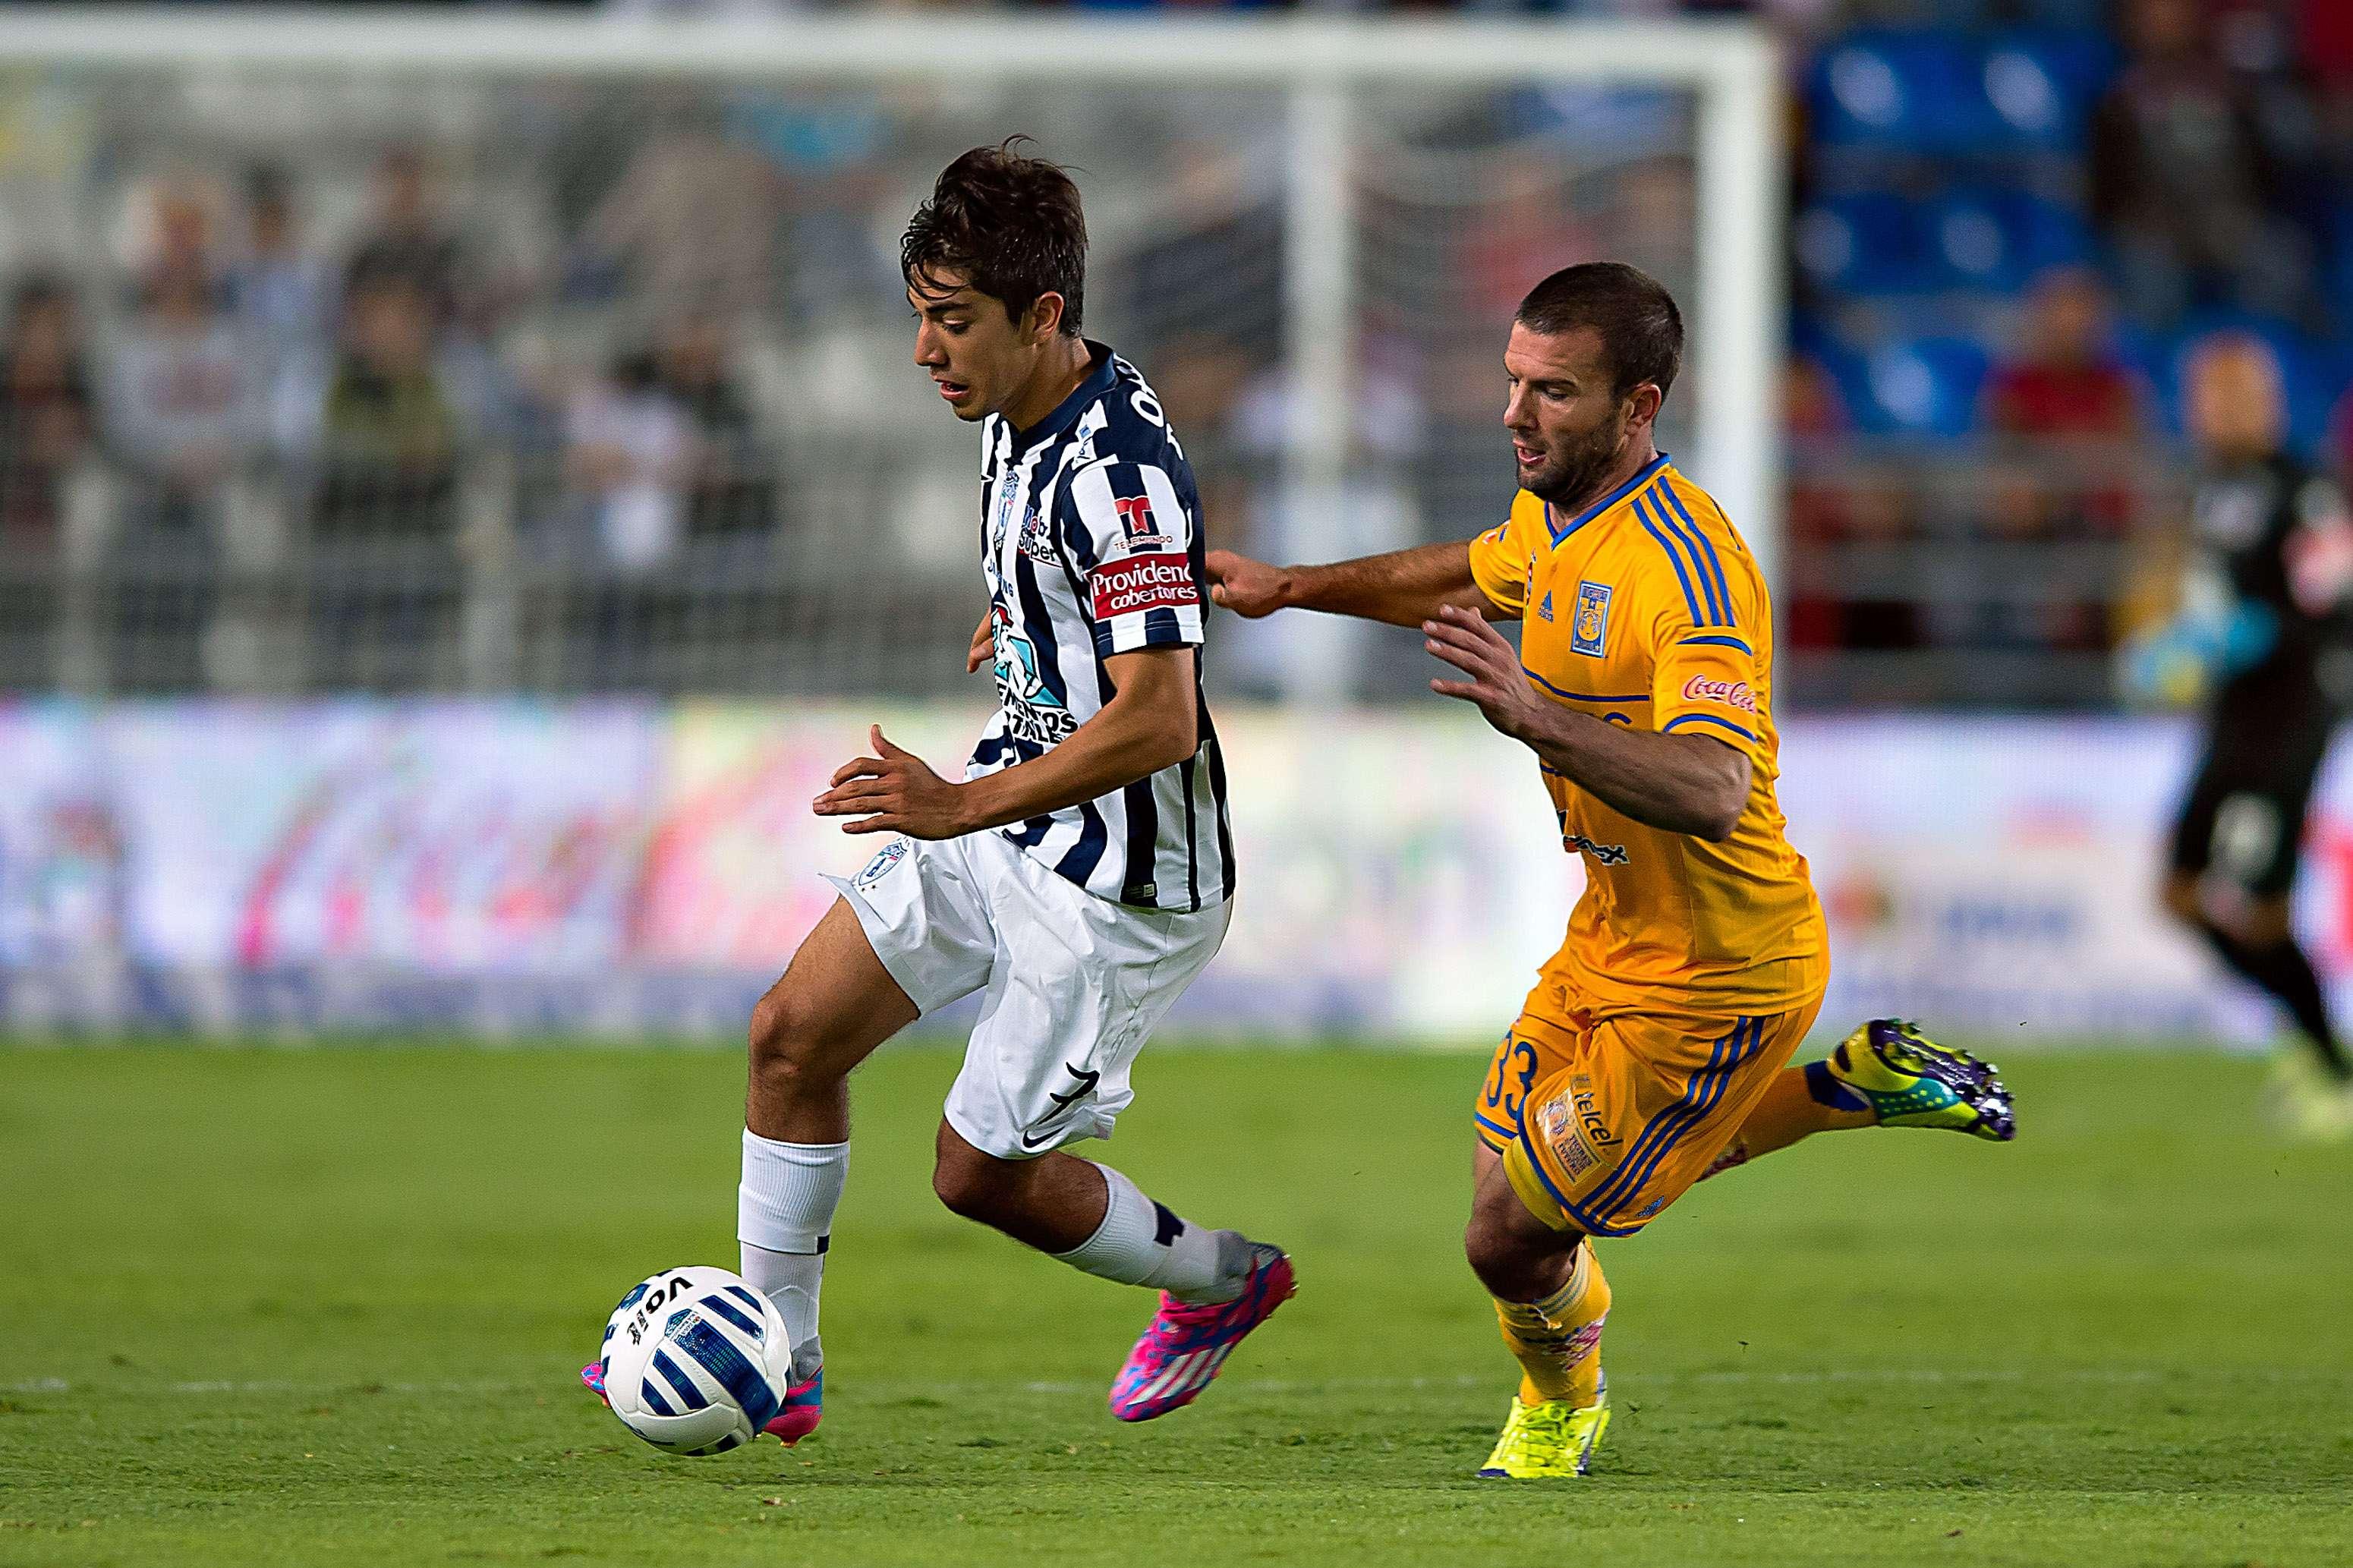 Tigres fue el equipo que mejor cerró en la fase regular Foto: Mexsport